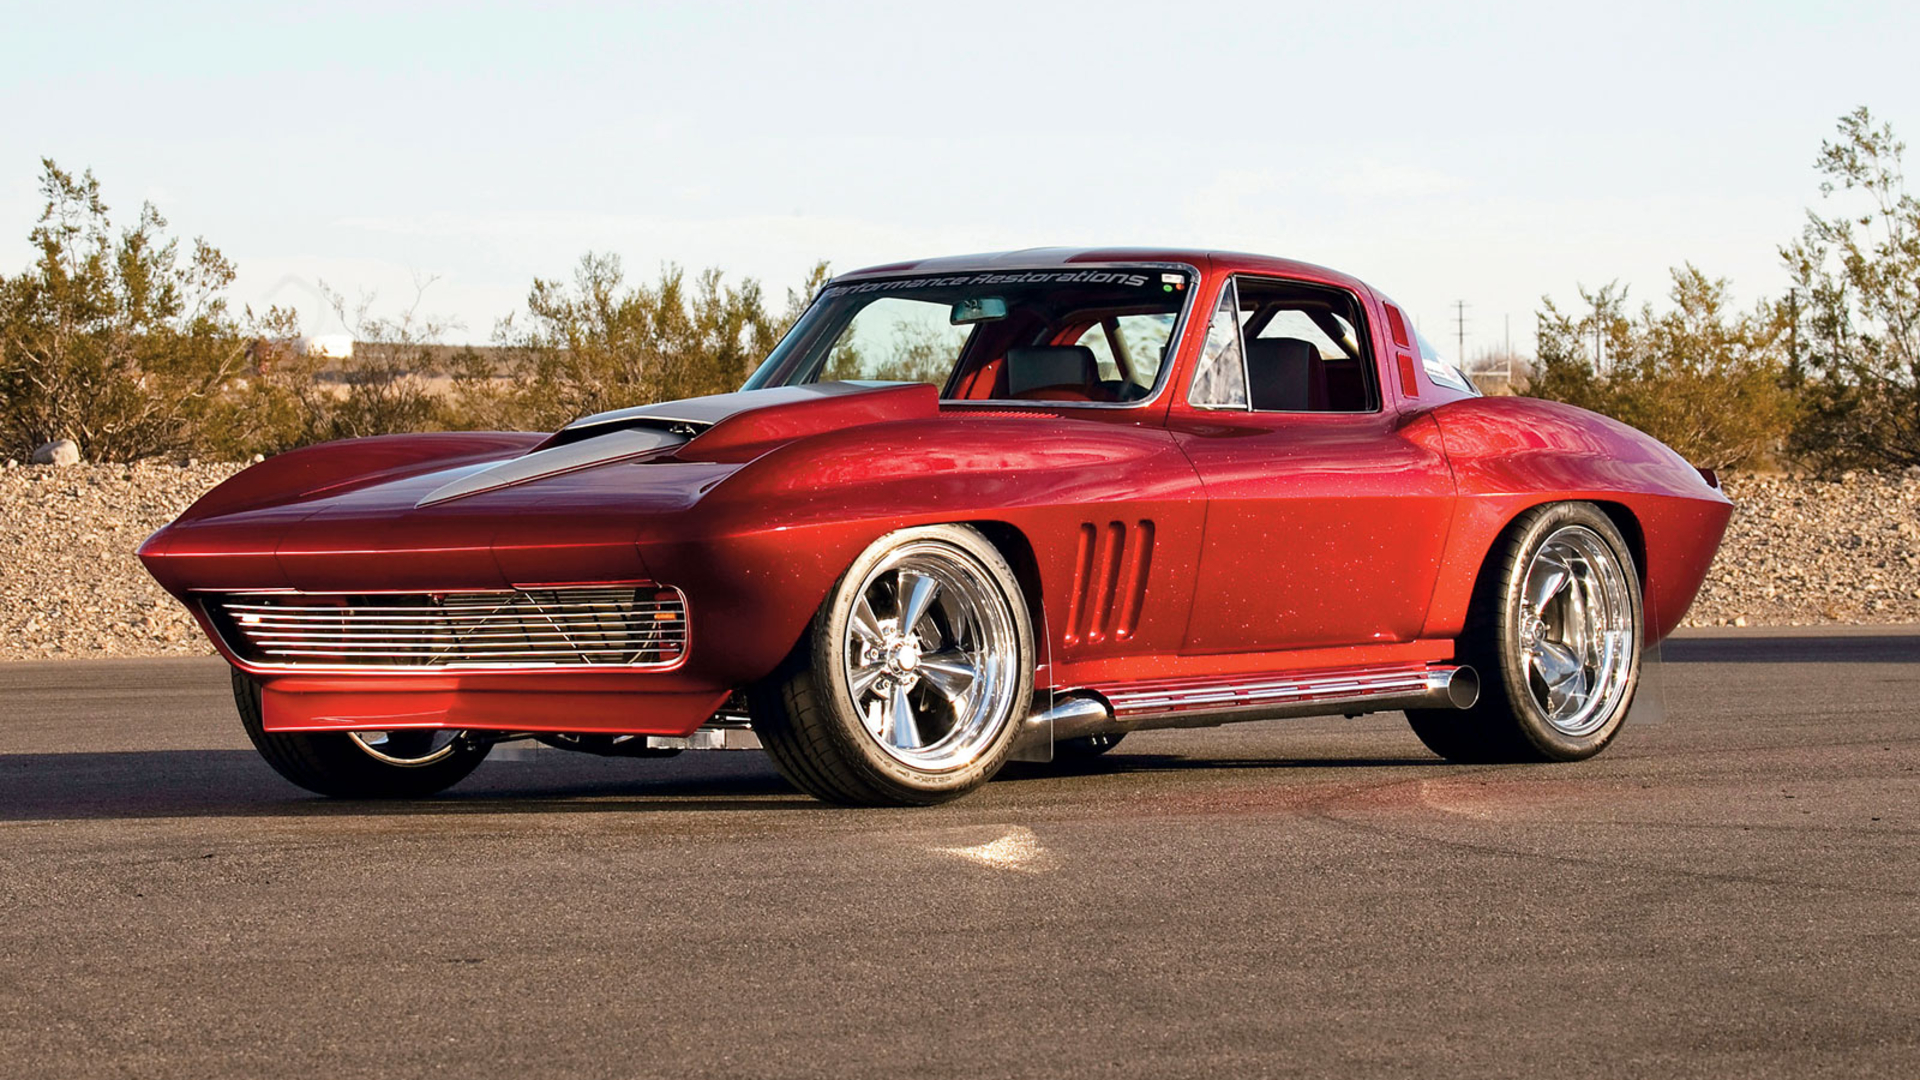 Chevy Muscle Car Wallpaper: 1965 Corvette Optima Ultimate Street Car HD Wallpaper